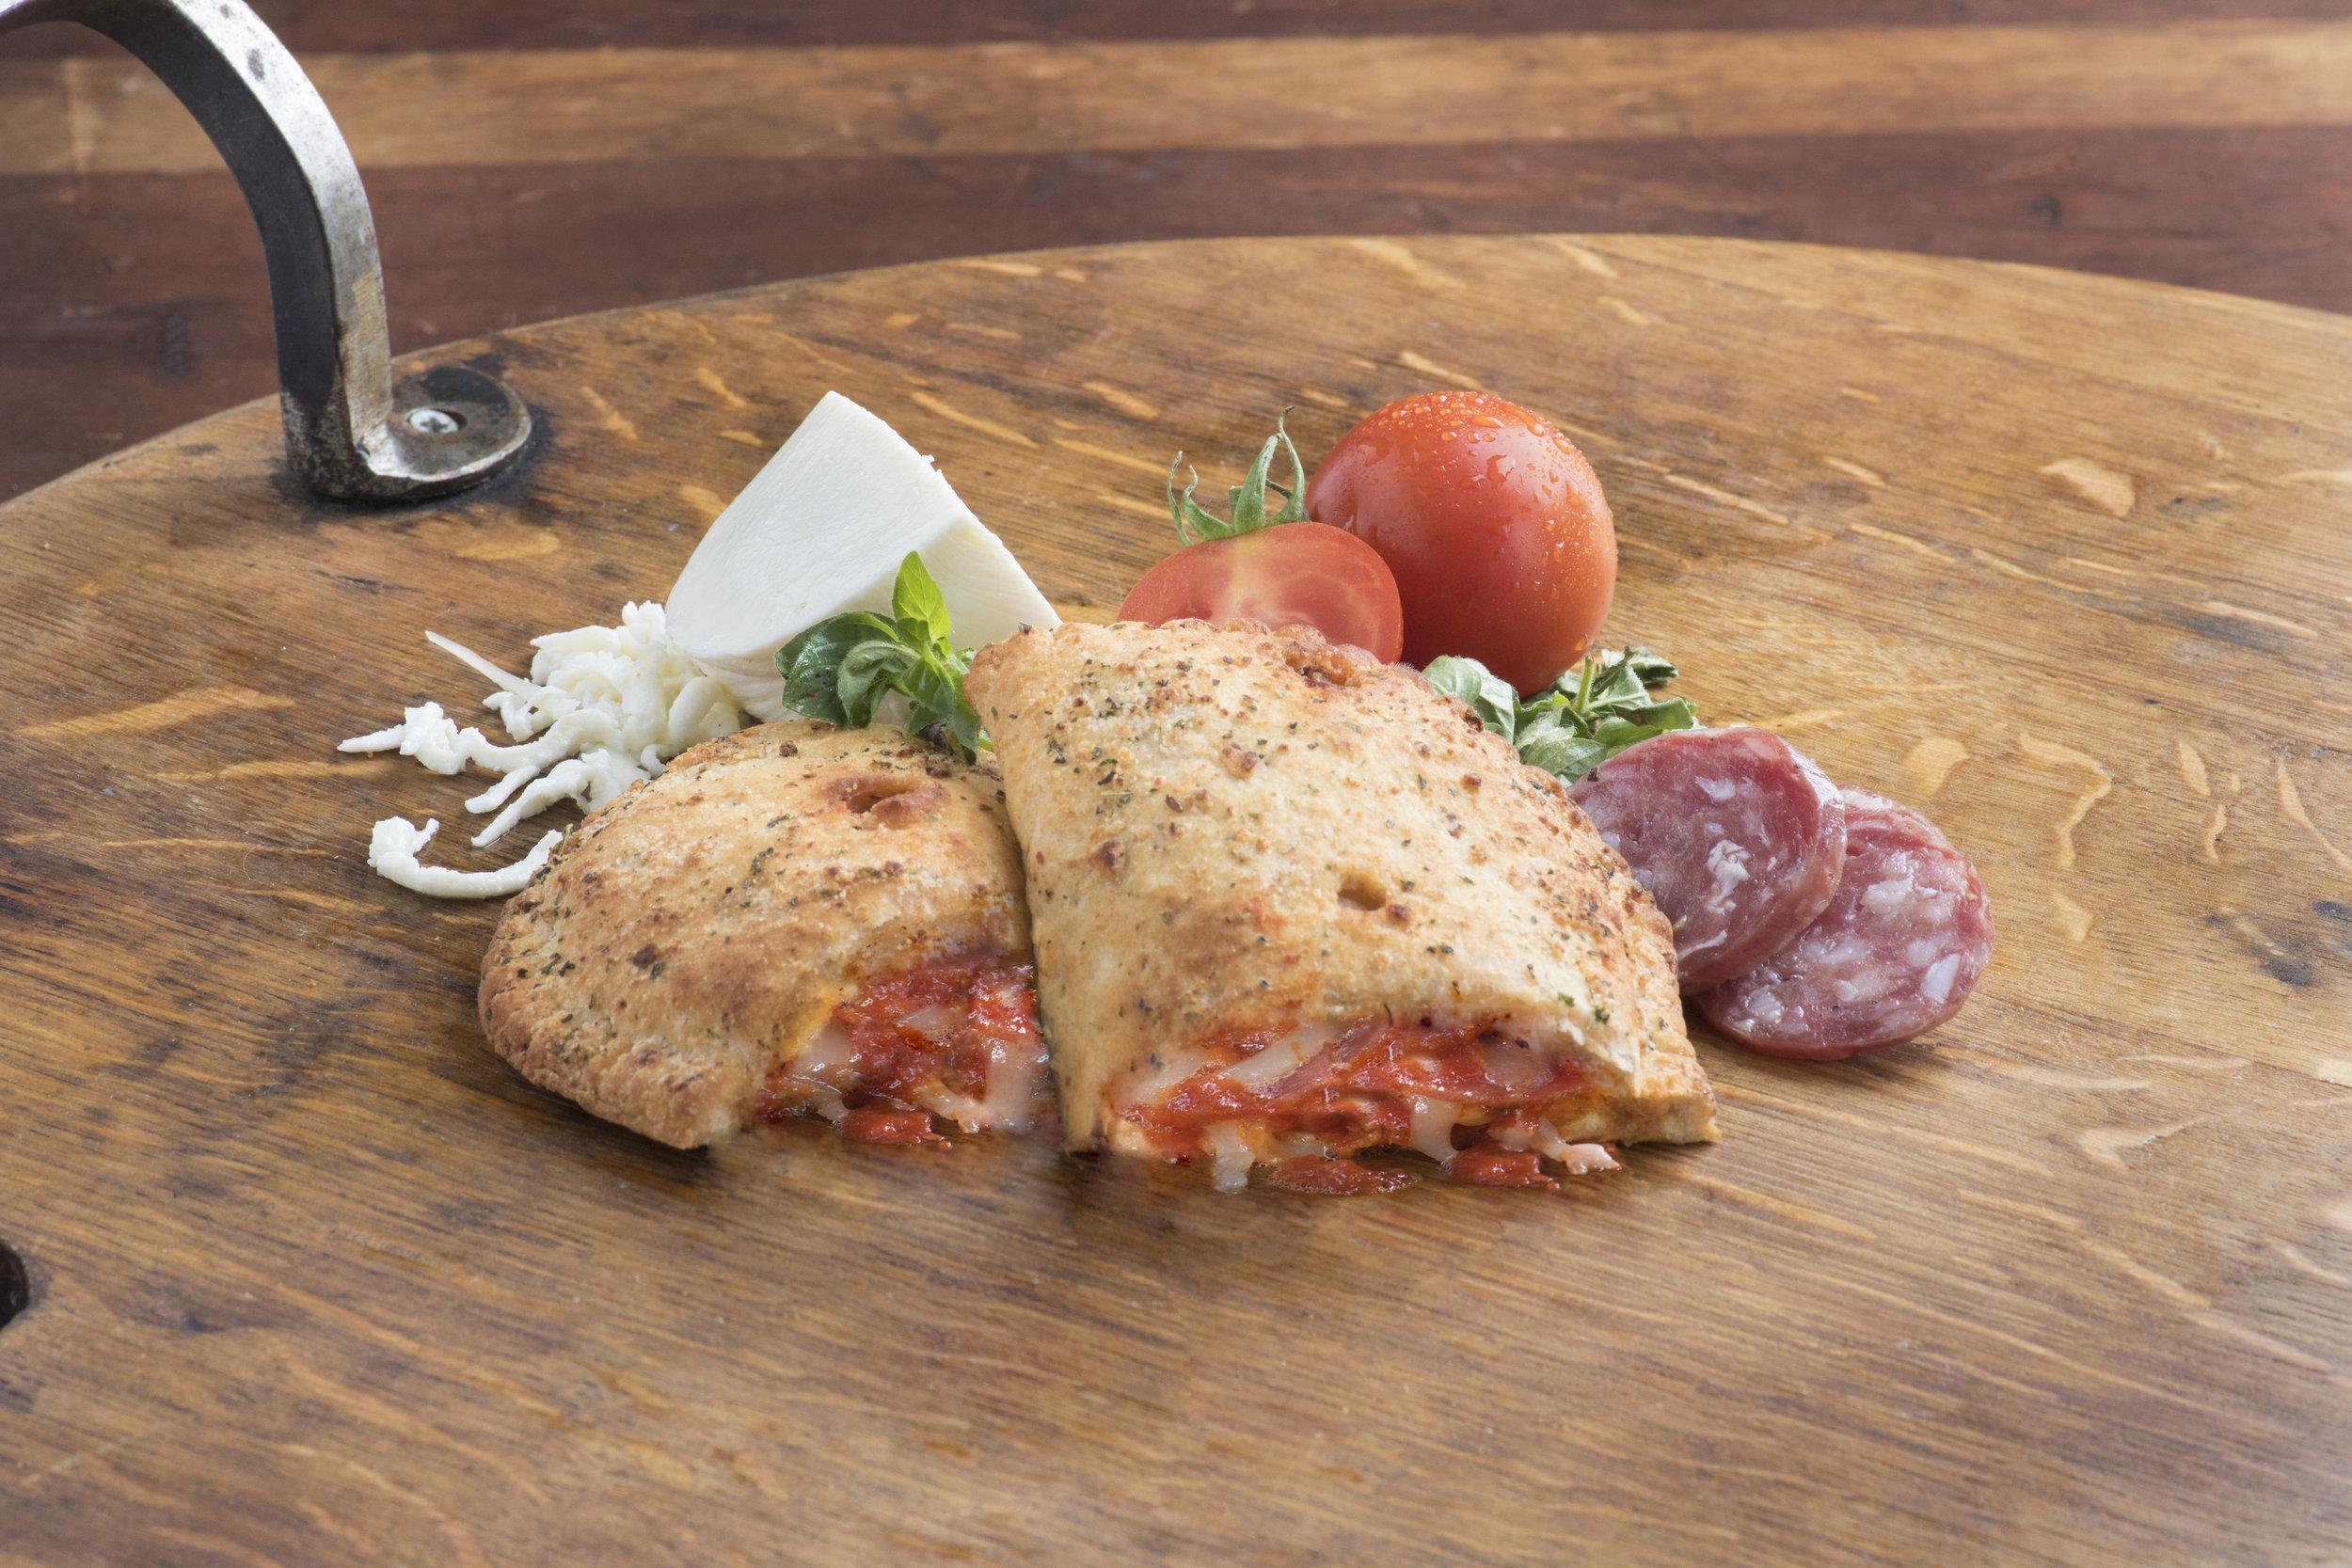 Split Top Pepperoni Flavored Calzone